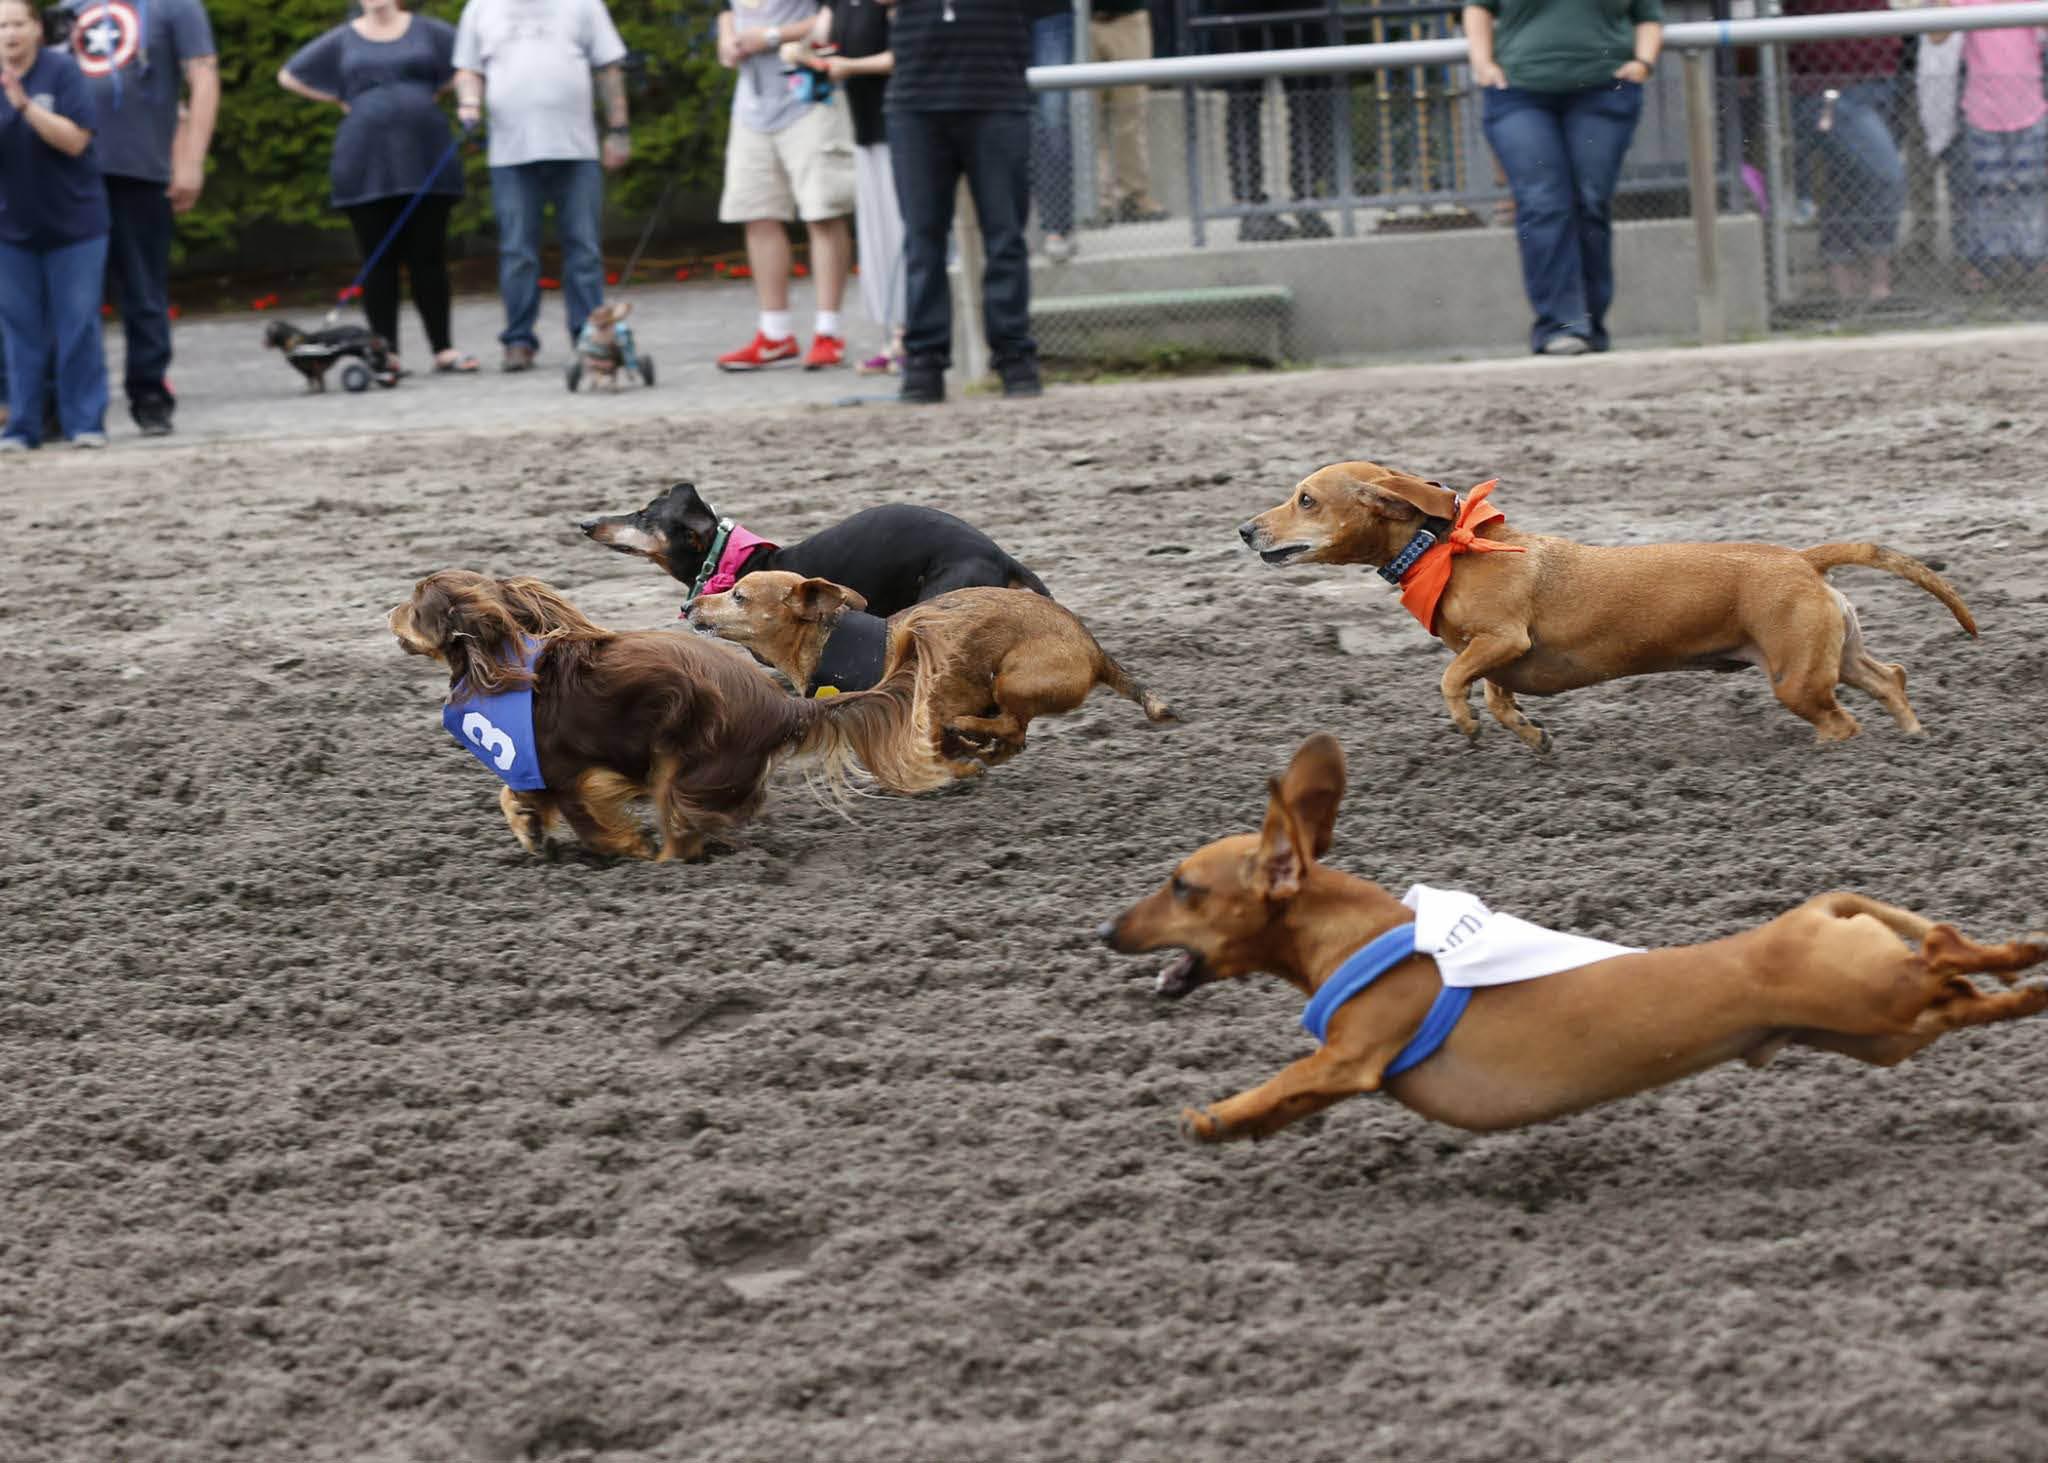 Wiener dog races at Emerald Downs in Auburn, Washington